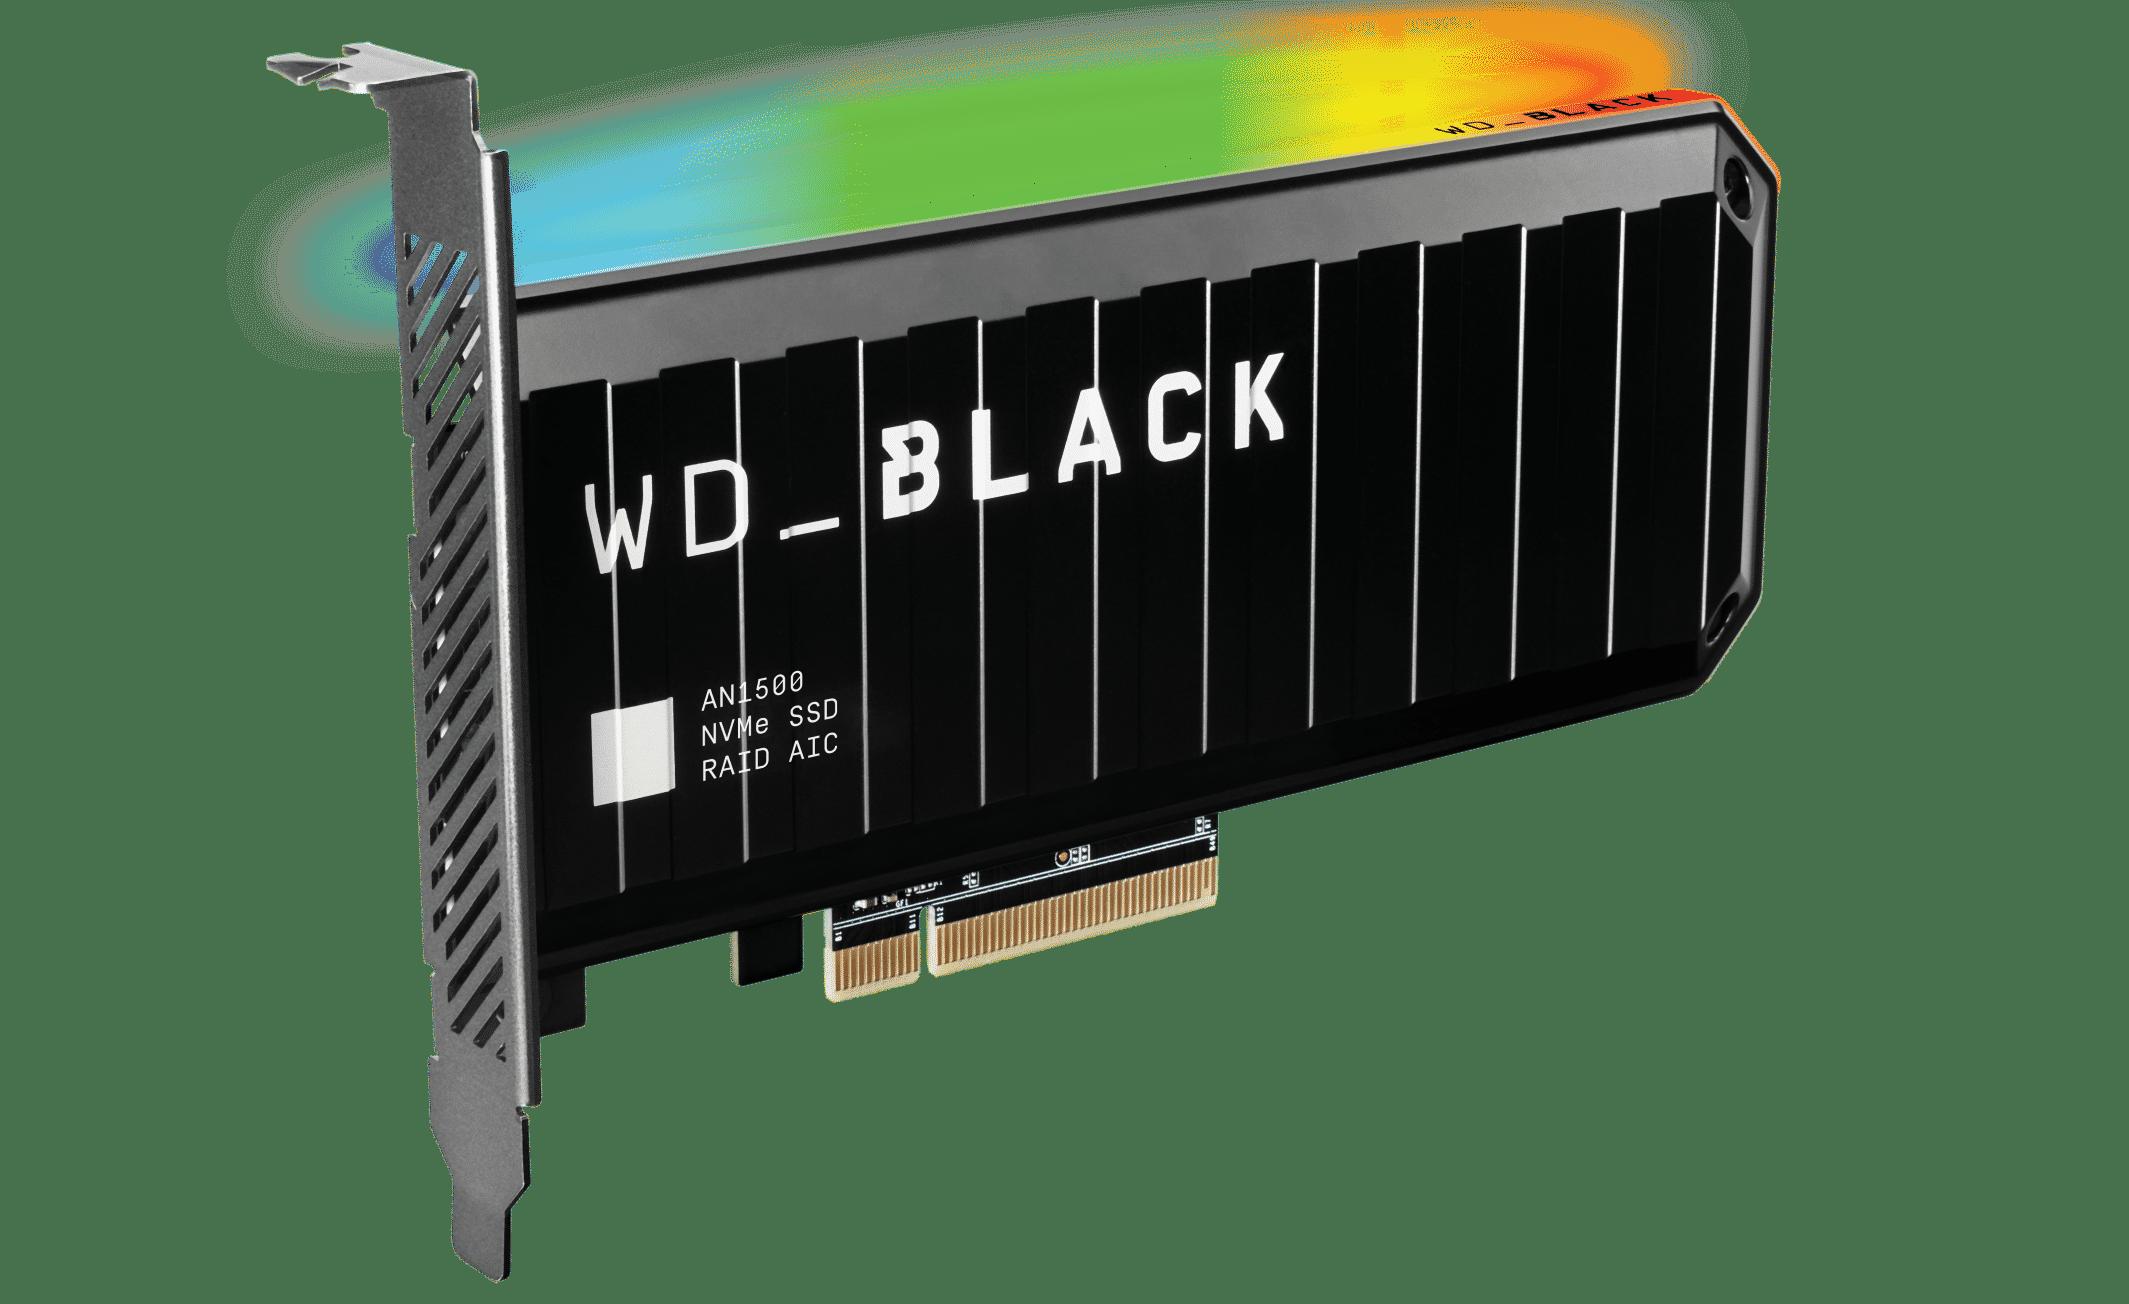 WD_BLACK AN1500 NVMe SSD Add-in-Card